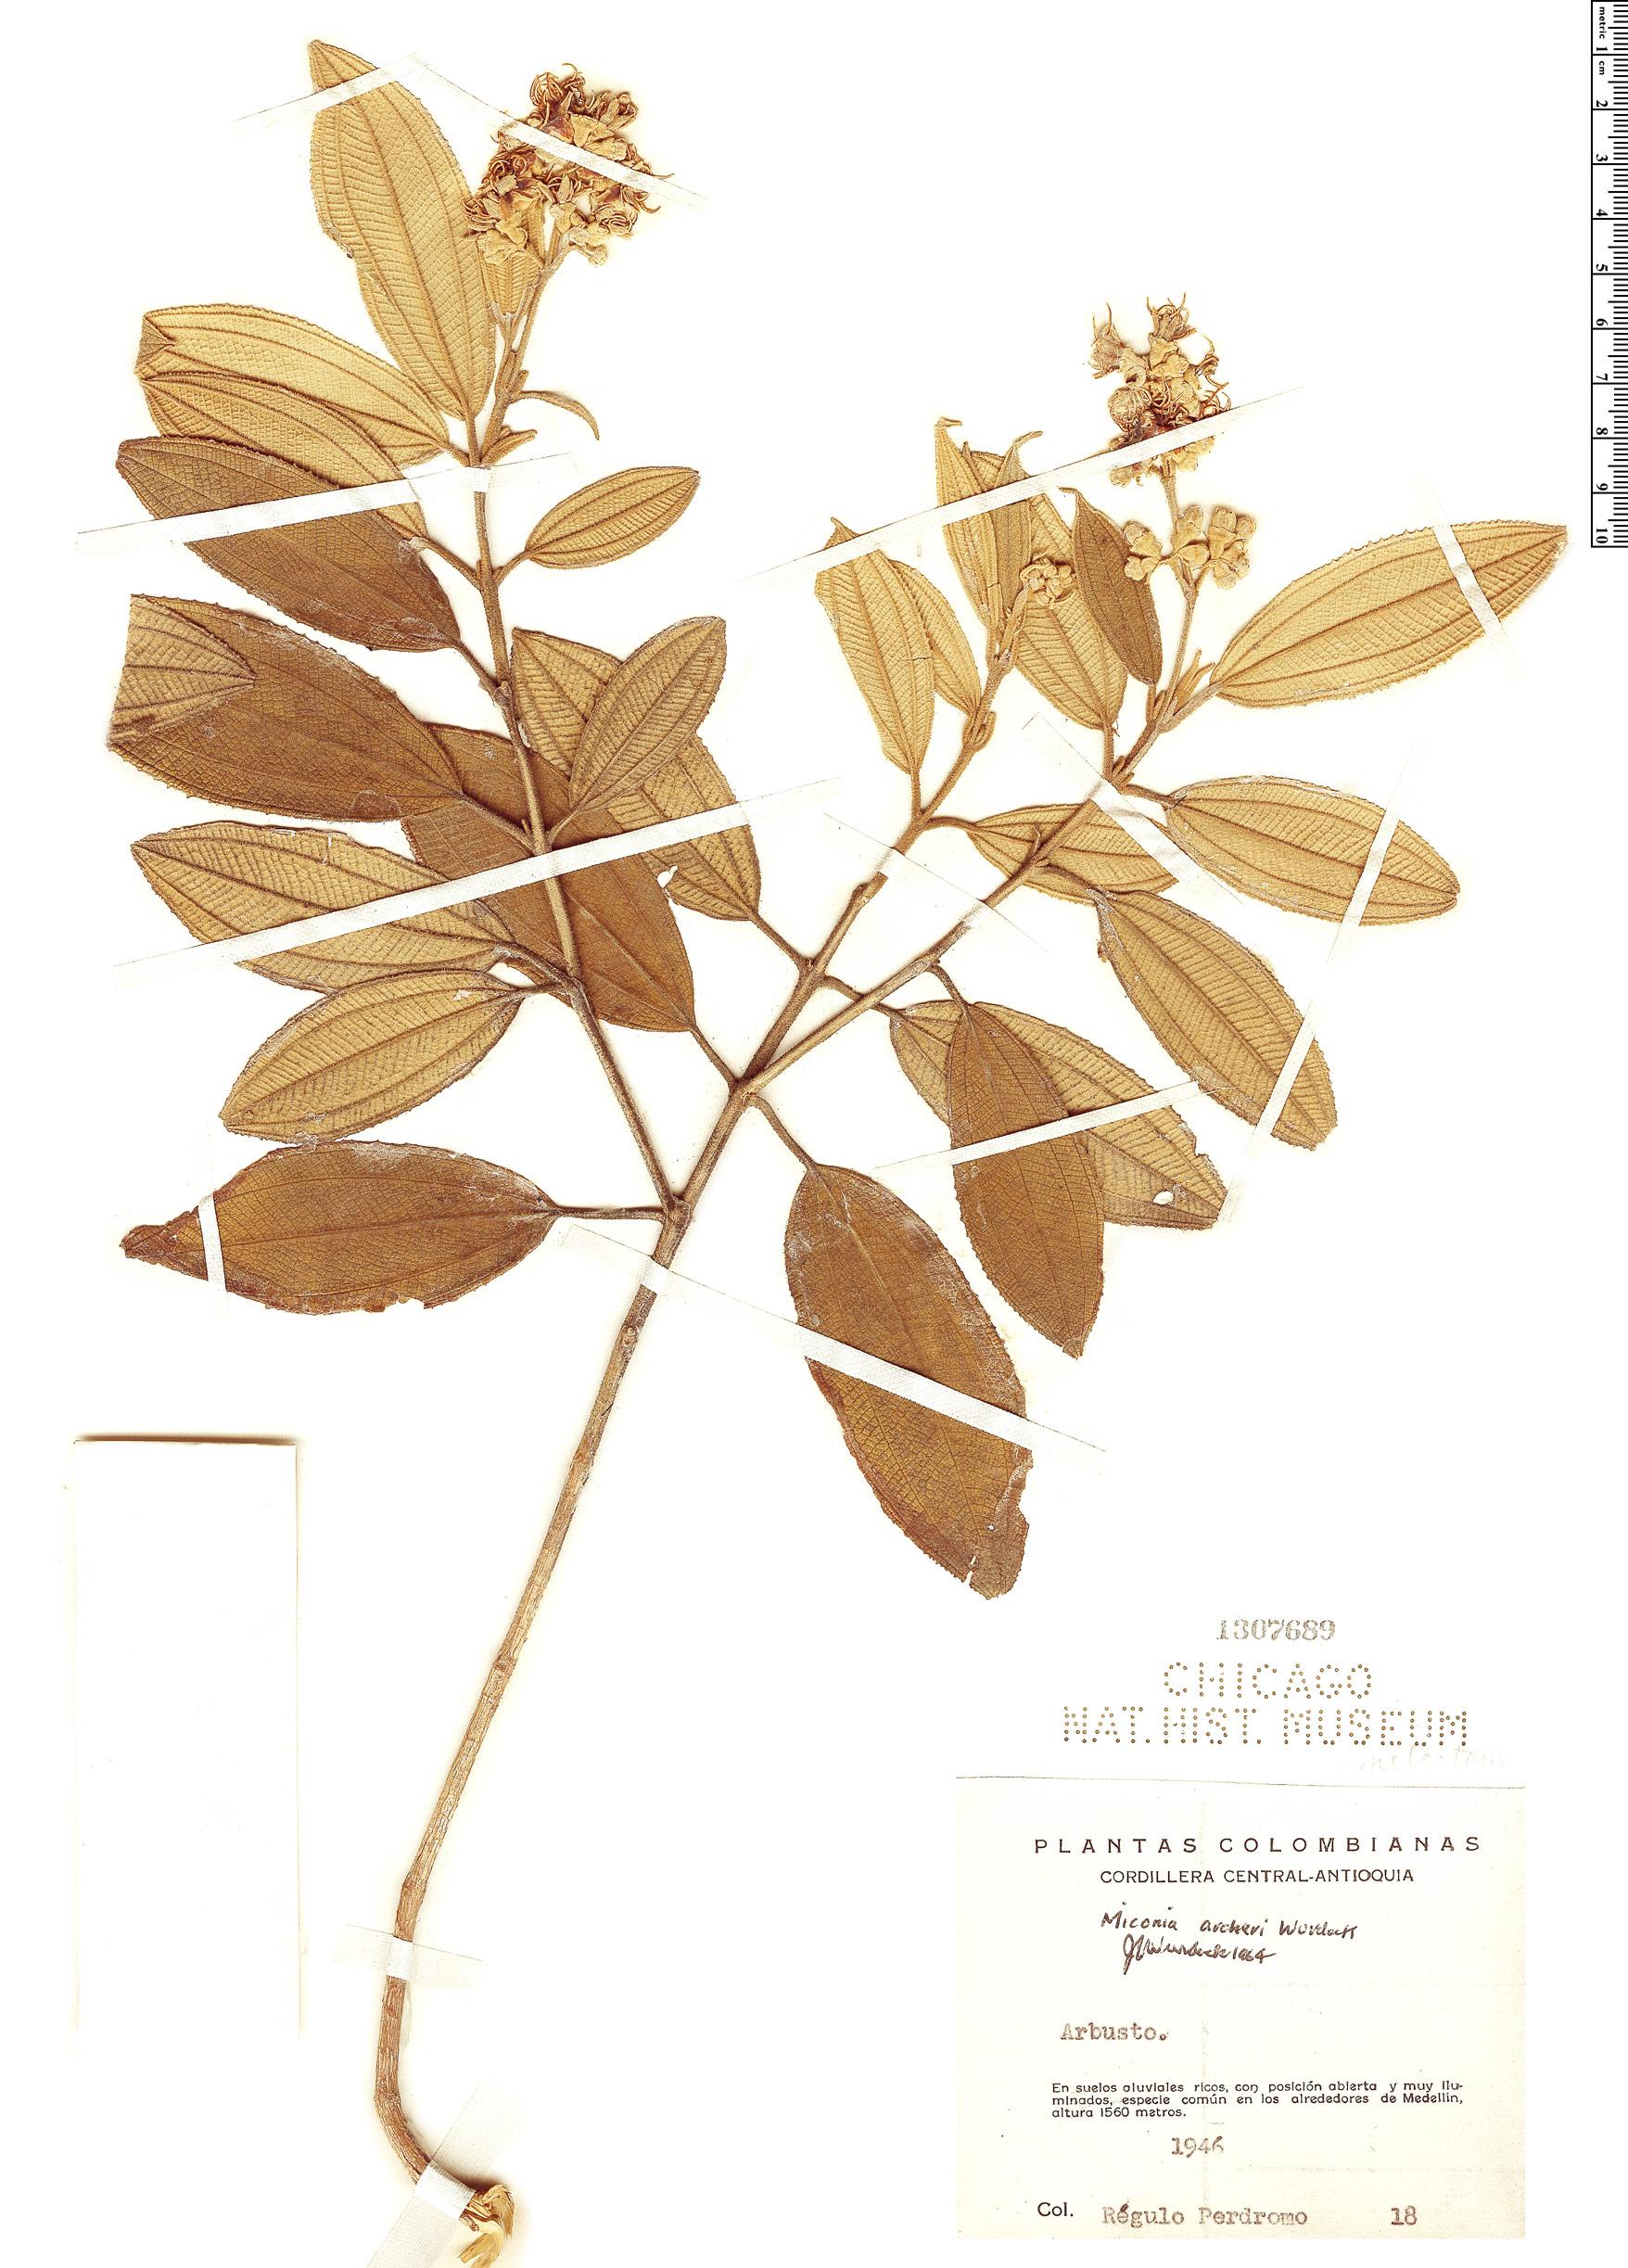 Specimen: Miconia archeri